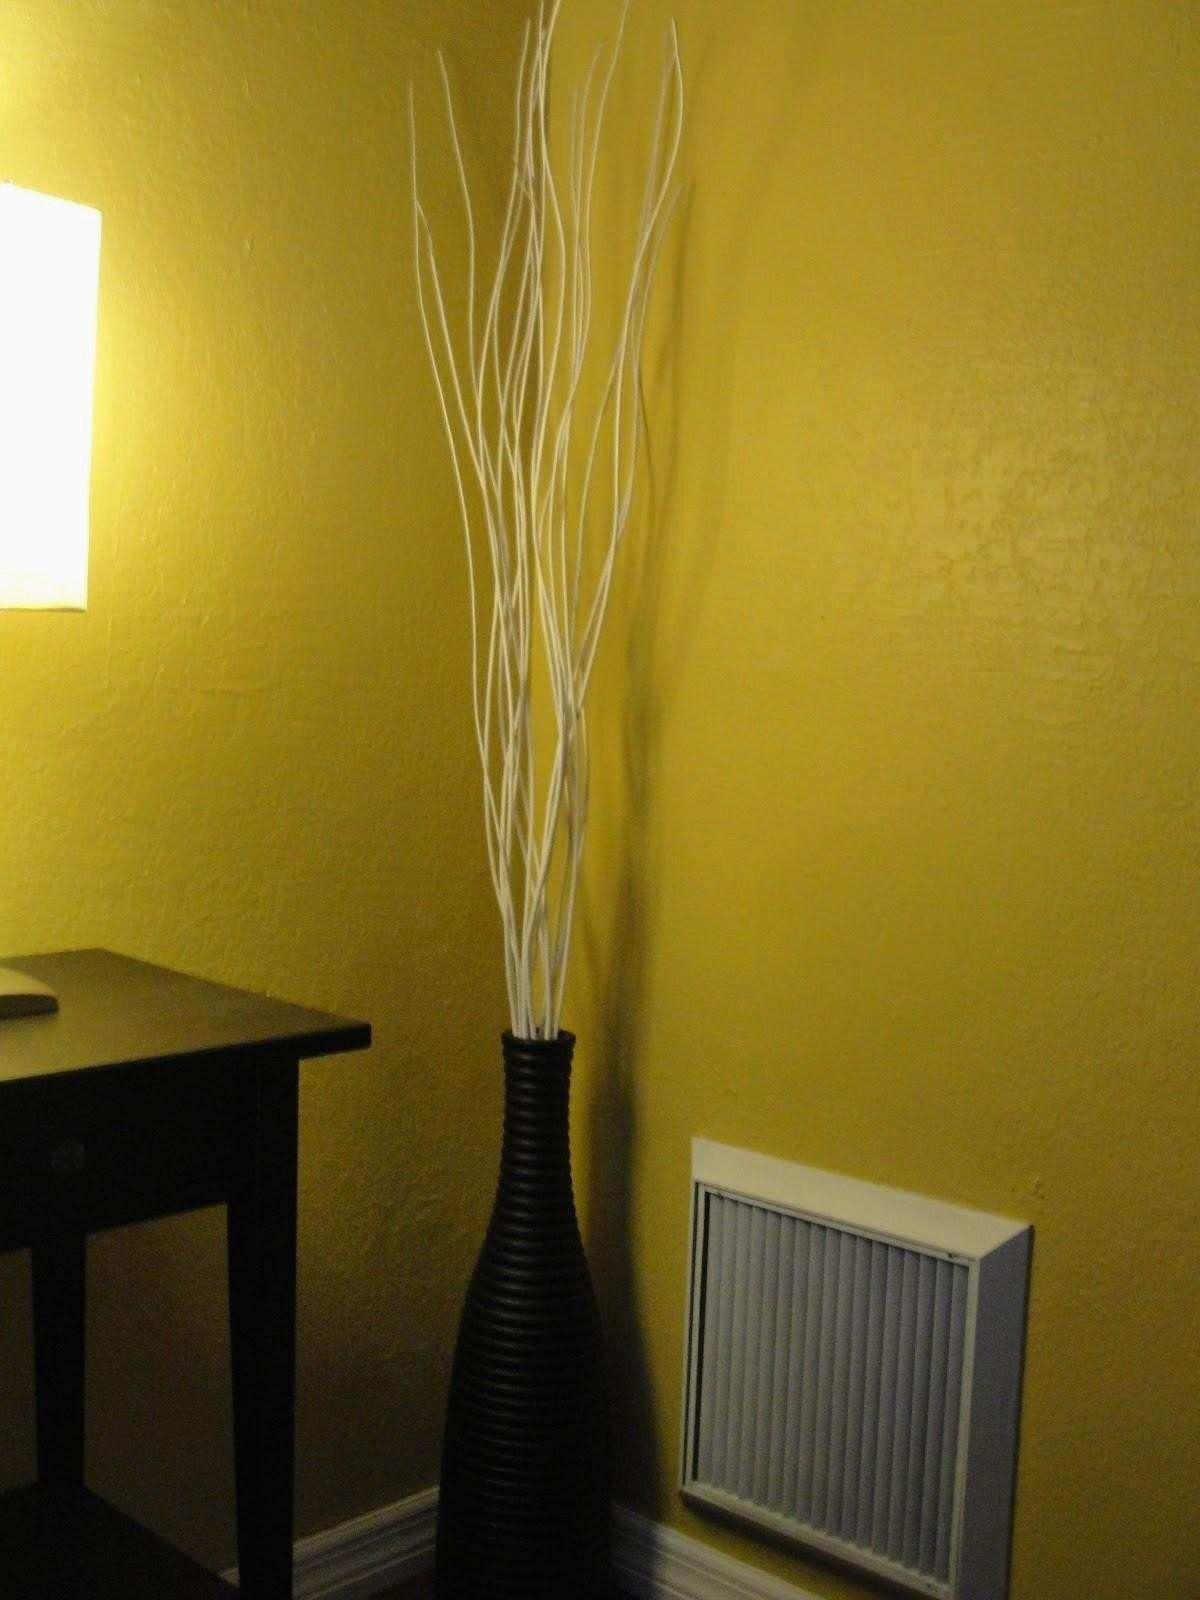 Pier One Bedroom Set Best Of 11 Fantastic Pier E Tall Vases